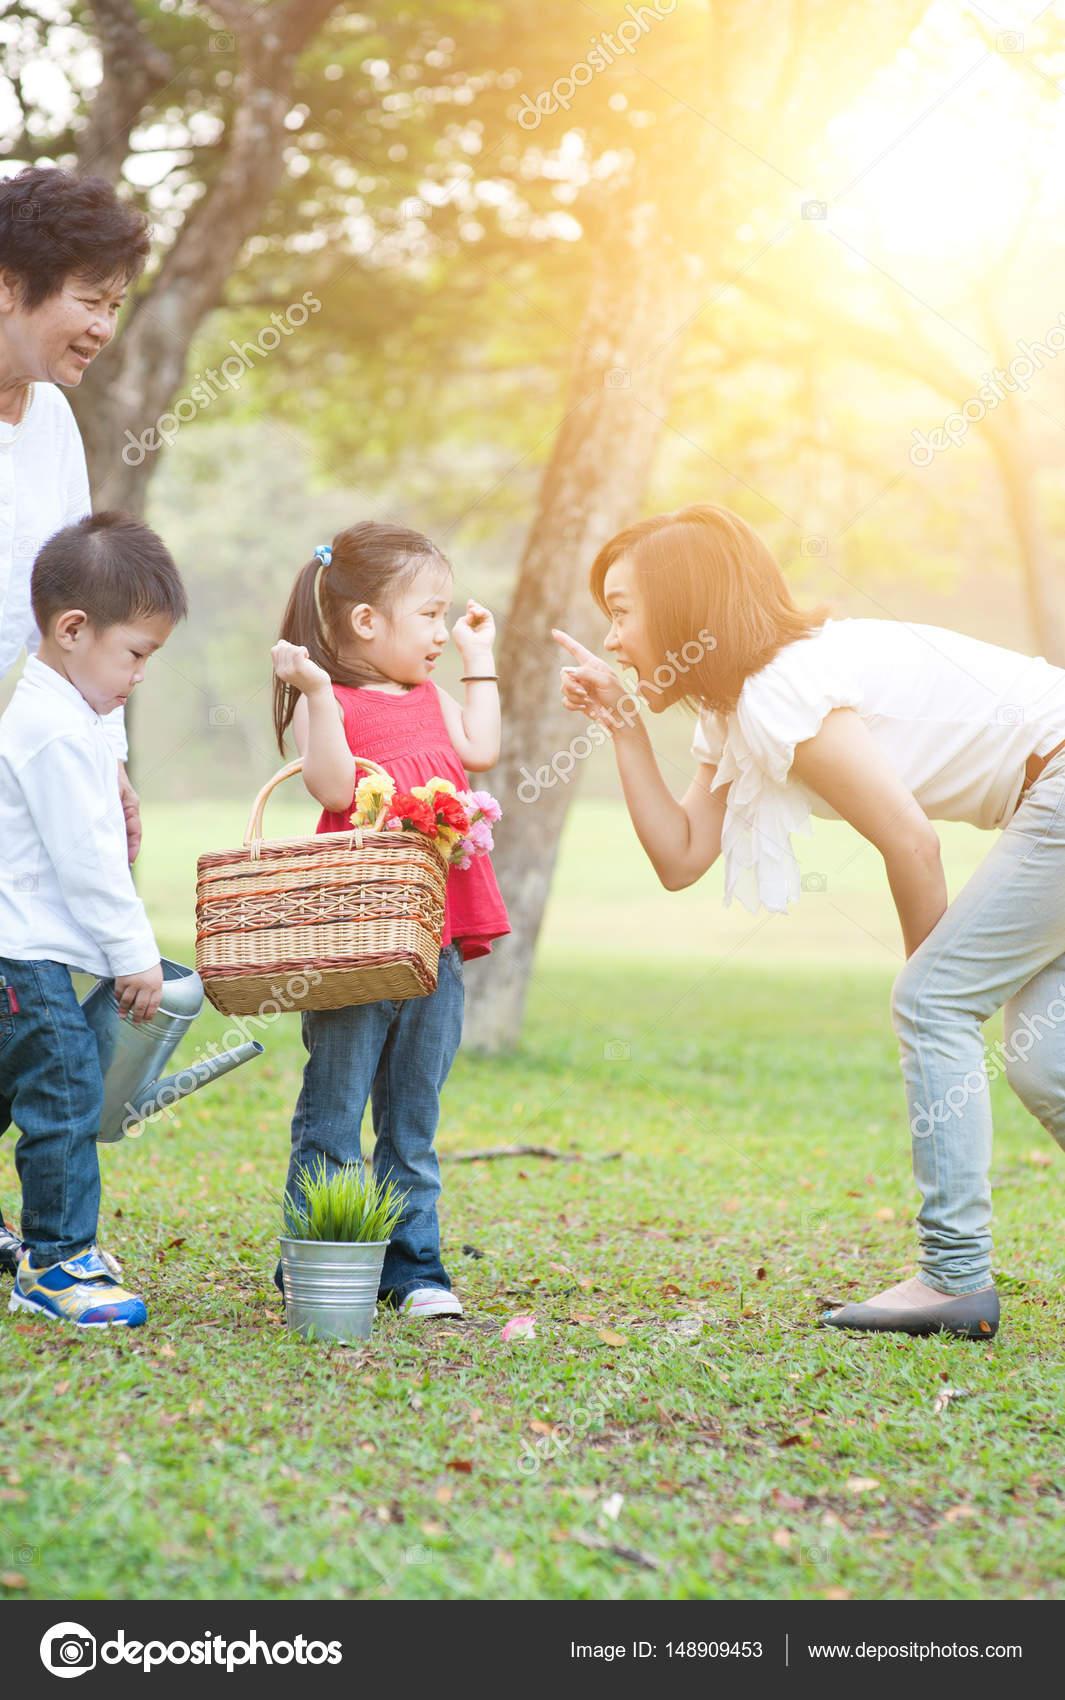 c591d9961a8 Αυθεντικές πορτρέτο του happy πολλαπλών γενεών ασιατικής οικογένειας στο  πάρκο. Γιαγιά, μητέρα και τα παιδιά υπαίθρια διασκέδαση. Το πρωί ήλιος  φωτοβολίδα ...